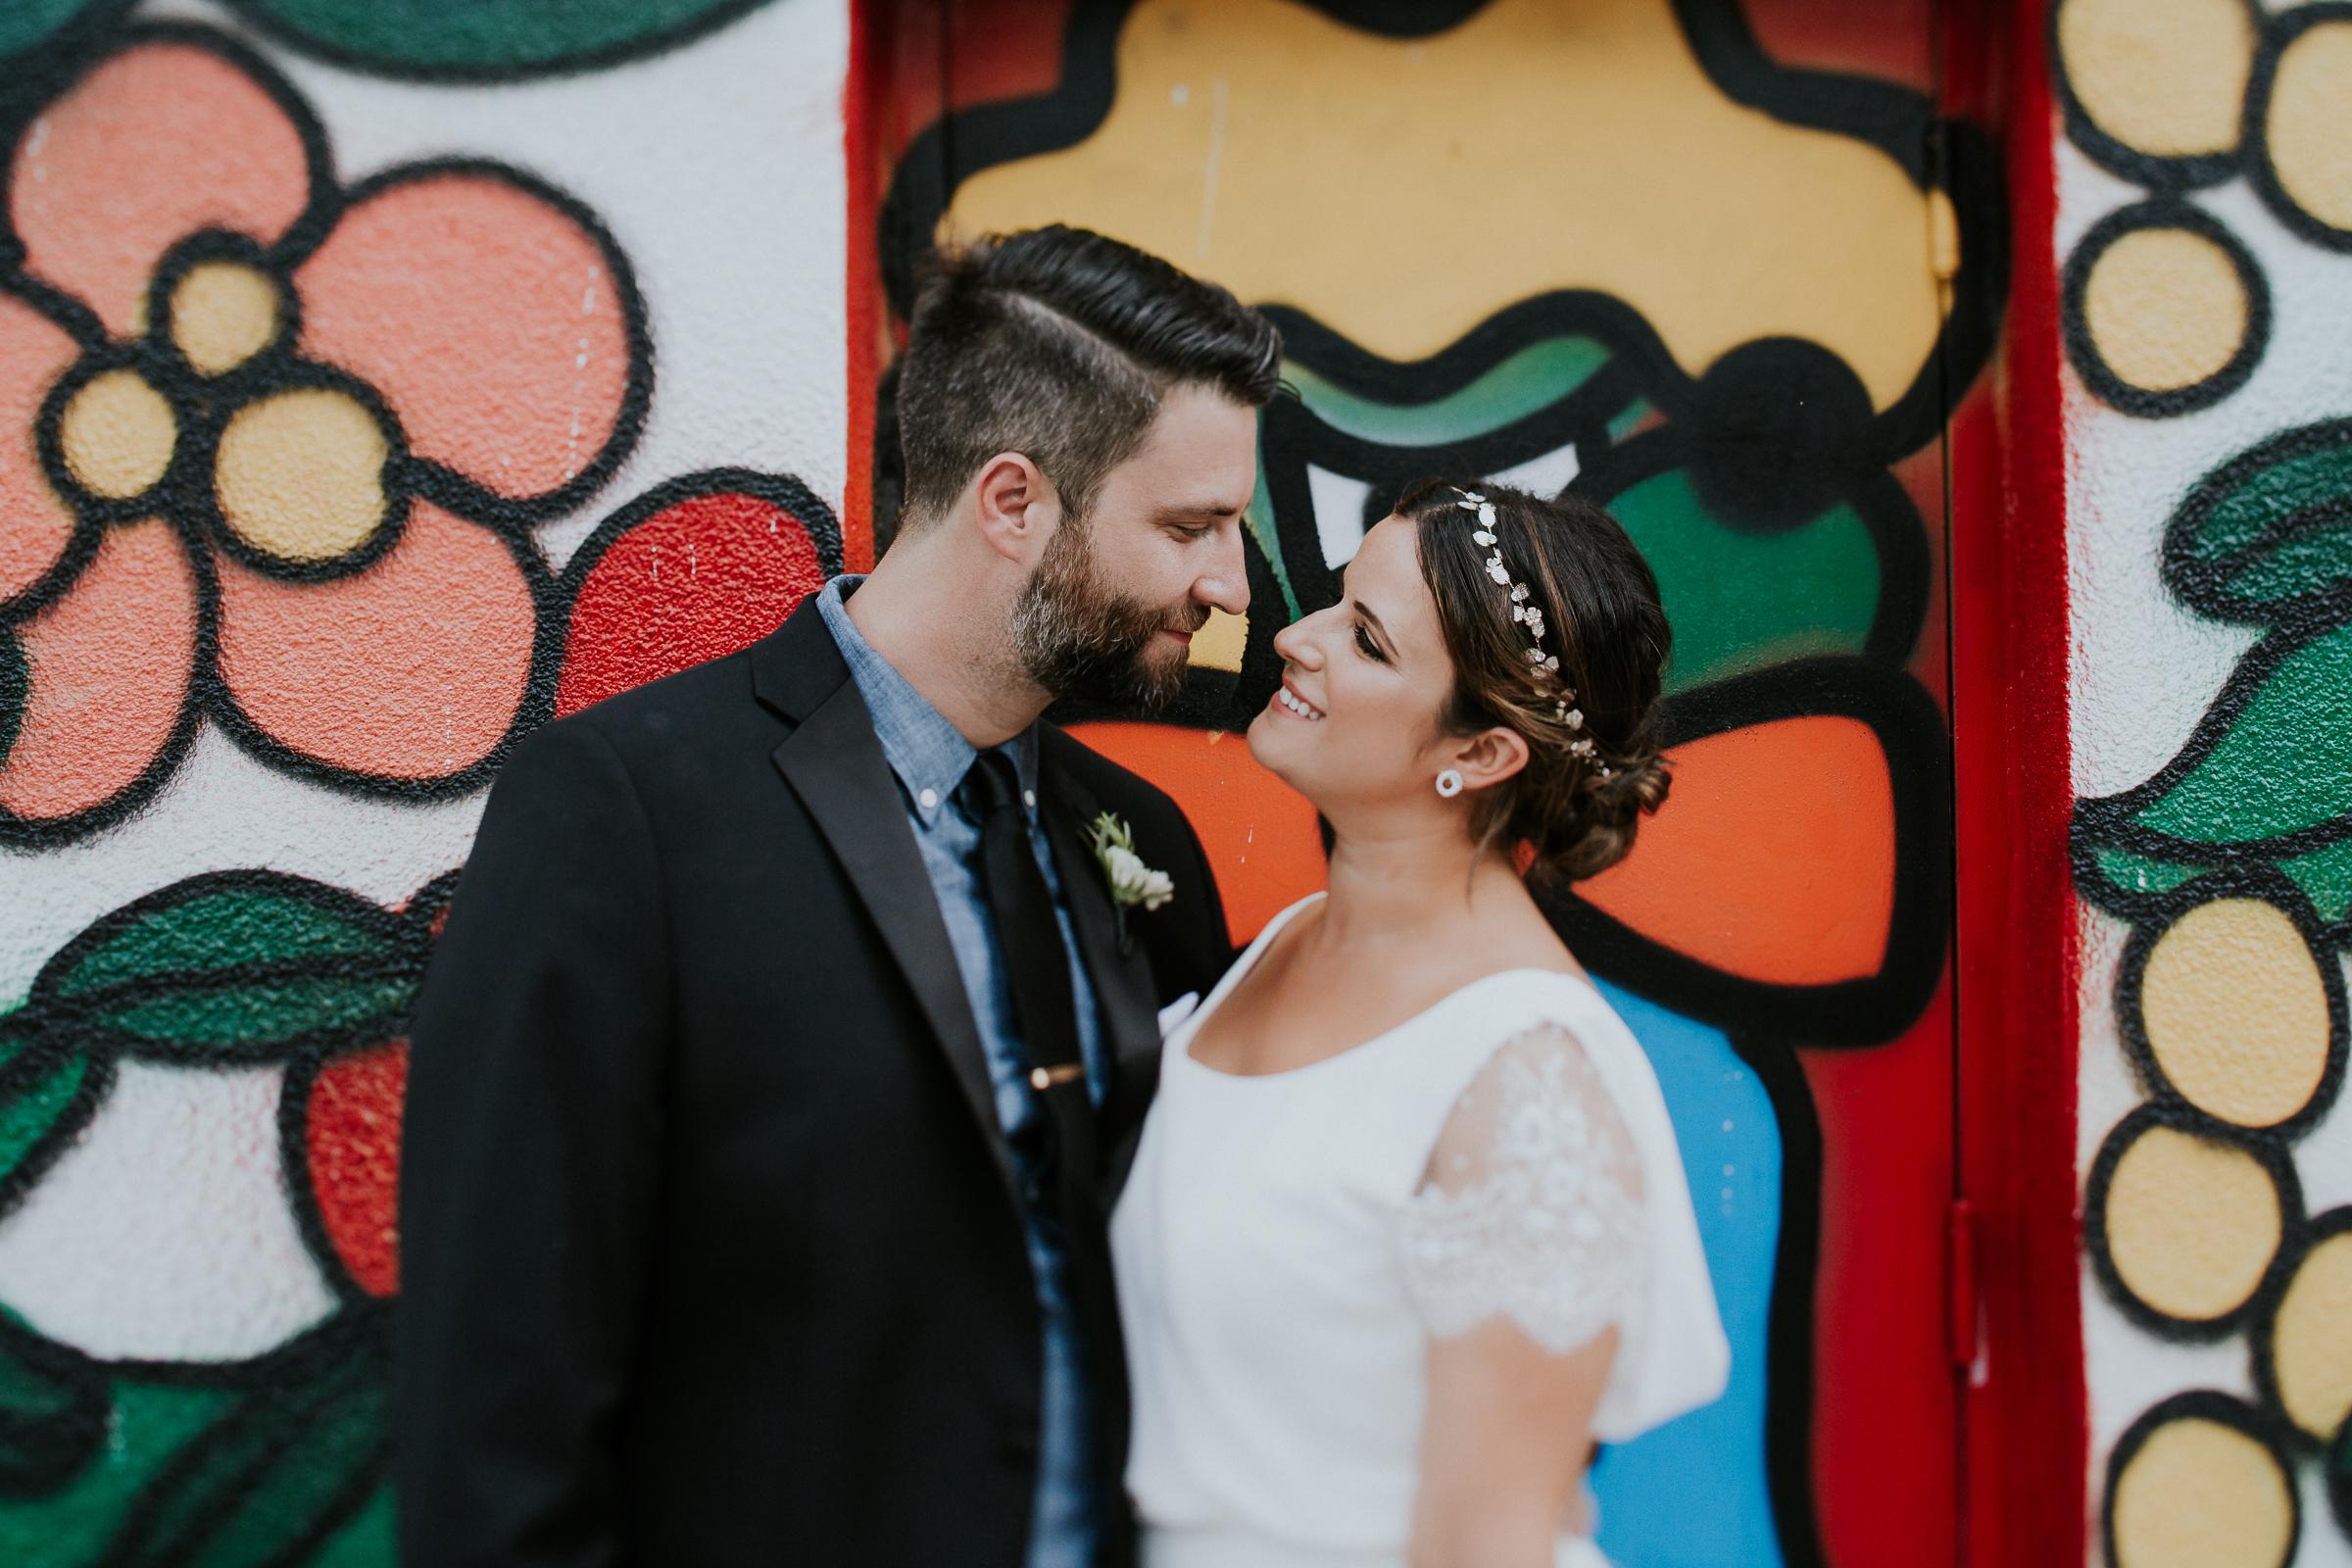 New-York-Documentary-Wedding-Photography-Best-Of-2017-by-Elvira-Kalviste-Photography-40.jpg